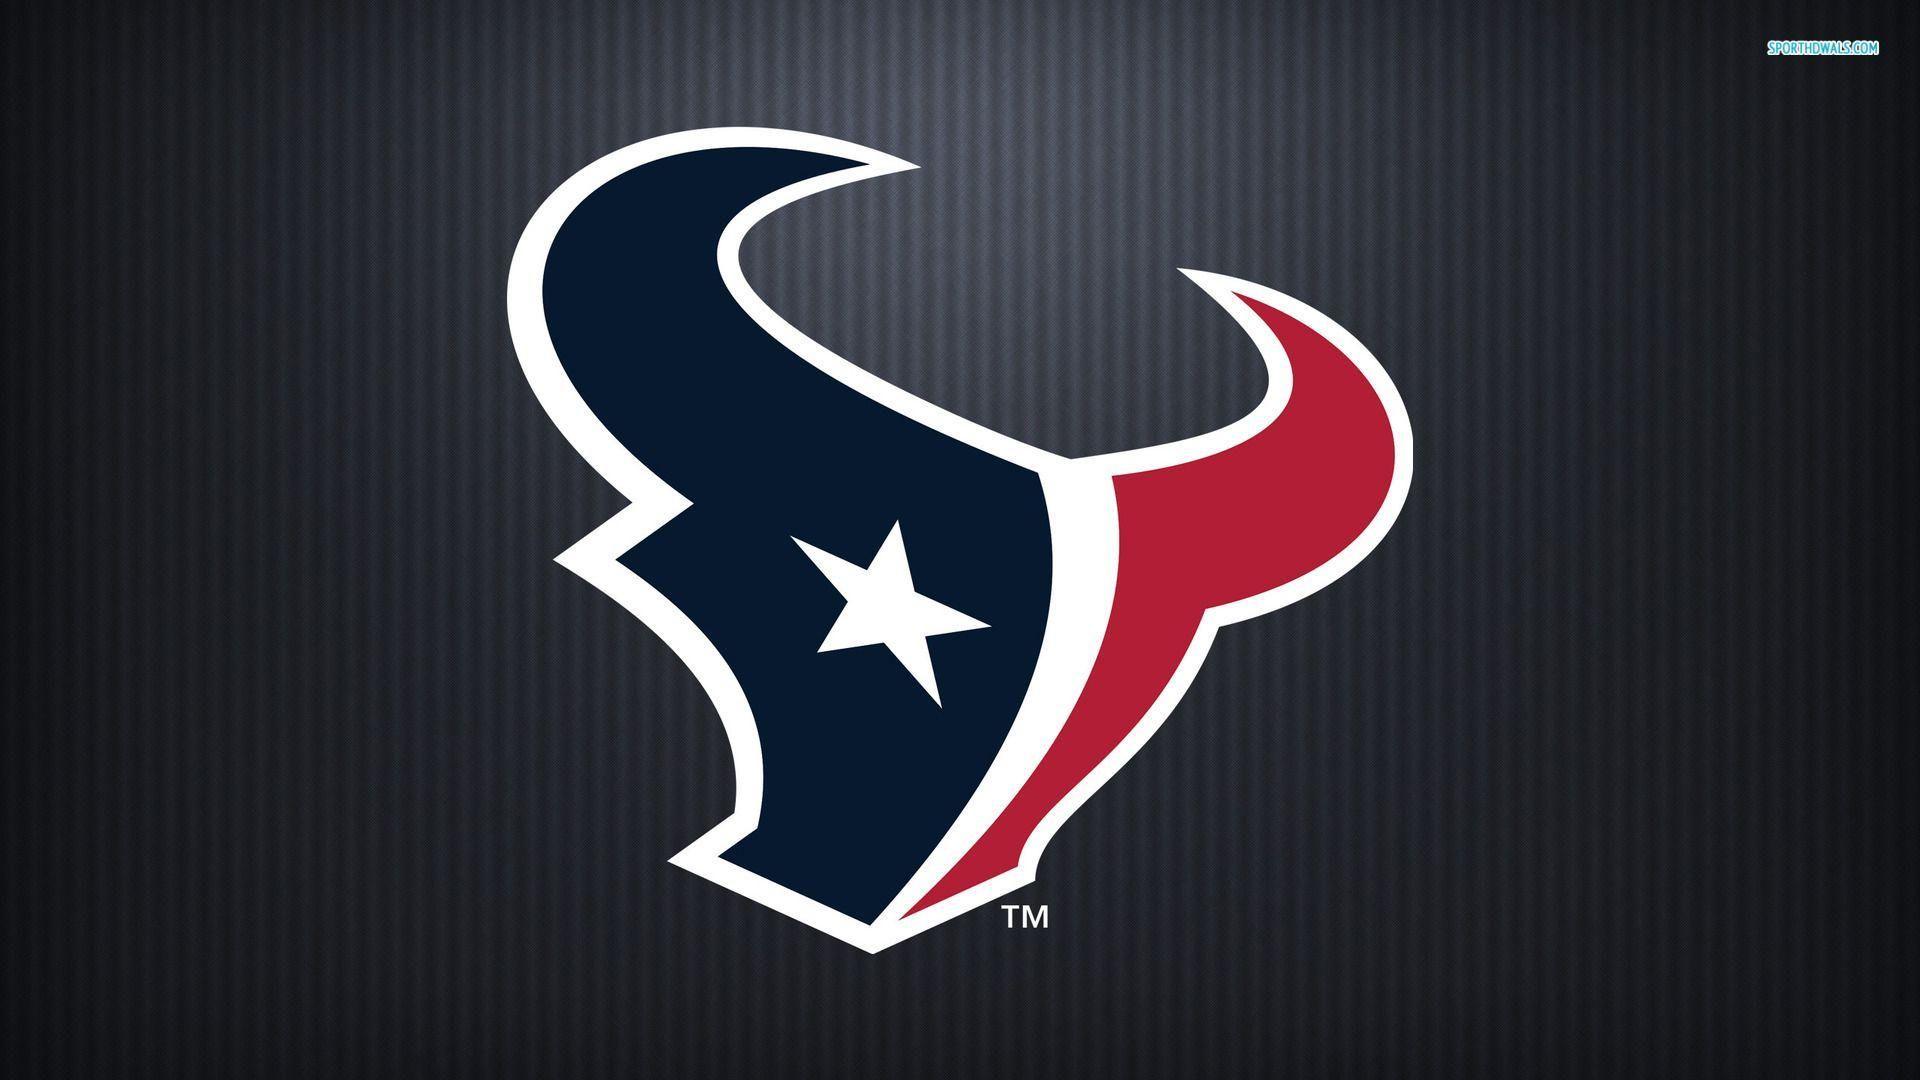 Houston Texans wallpaper pc